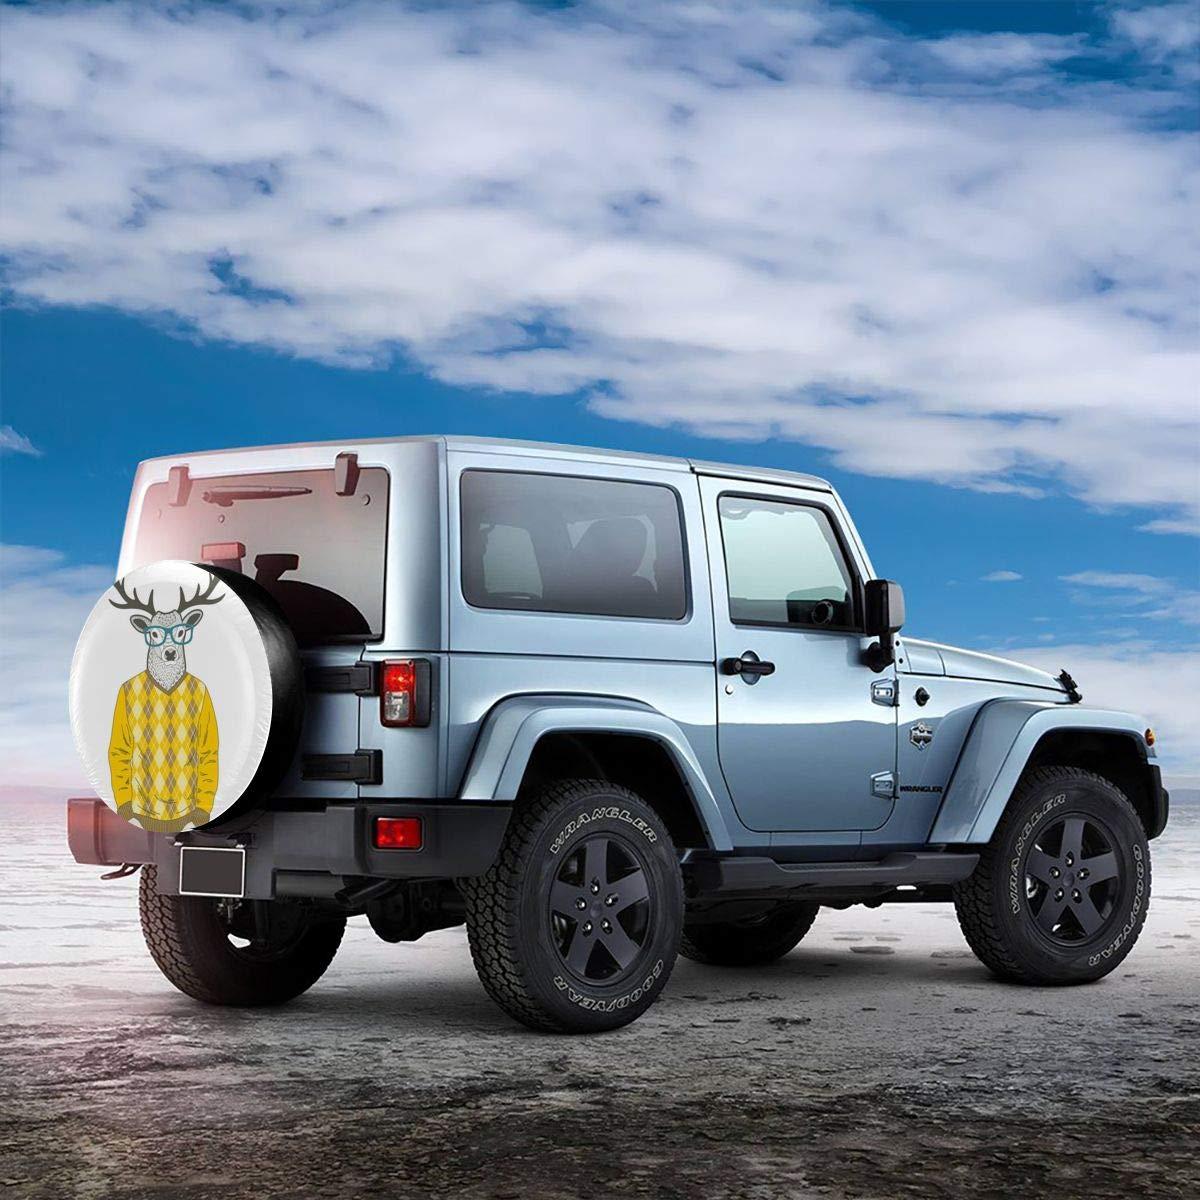 Mextrani Spare Tire Cover 14 15 16 17 inch Wheel Tire Cover for RV Camper Travel Trailer RAV4 Car Truck Tire